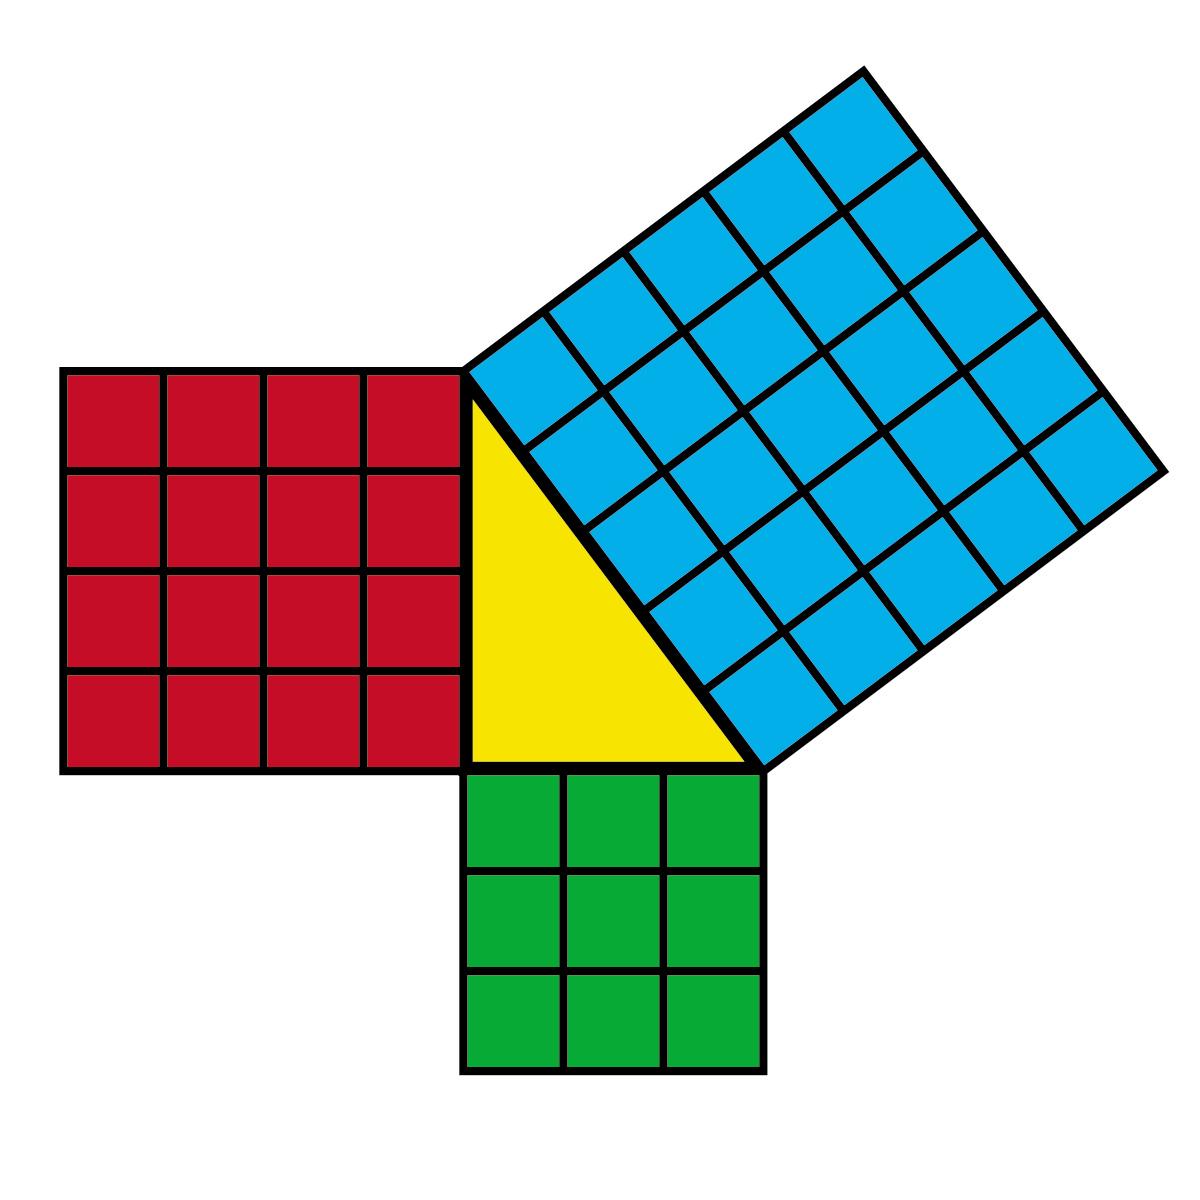 Geometry Angle Free Clipart #1-Geometry Angle Free Clipart #1-6